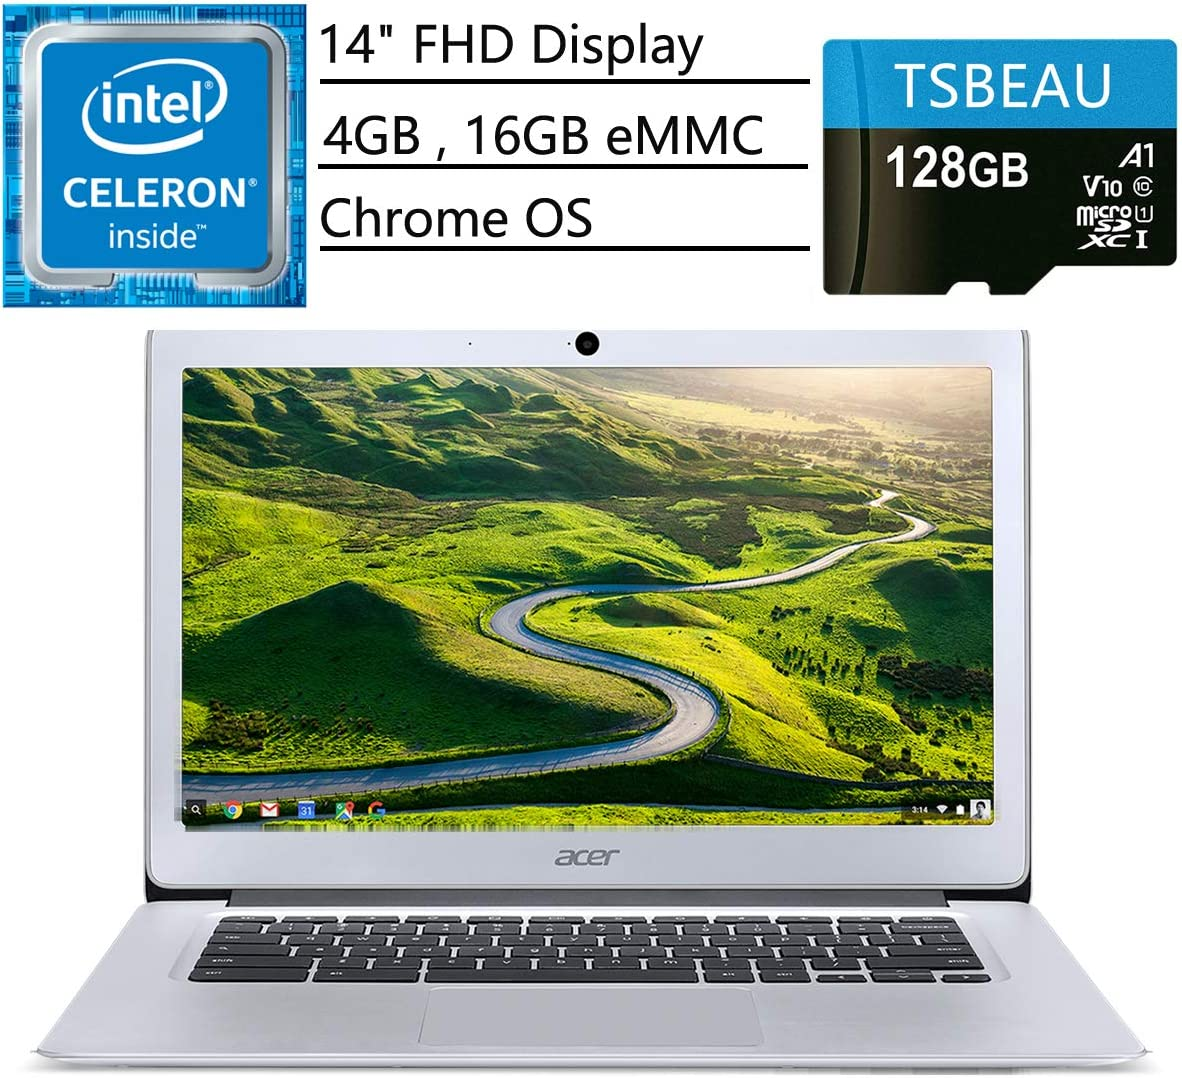 "Acer Chromebook 14 Laptop, 14"" Full HD IPS Display, Intel Celeron N3160 Quad-Core Processor 4GB 16GB eMMC, Chrome OS, Bundled with TSBEAU 128GB Micro SD Card"